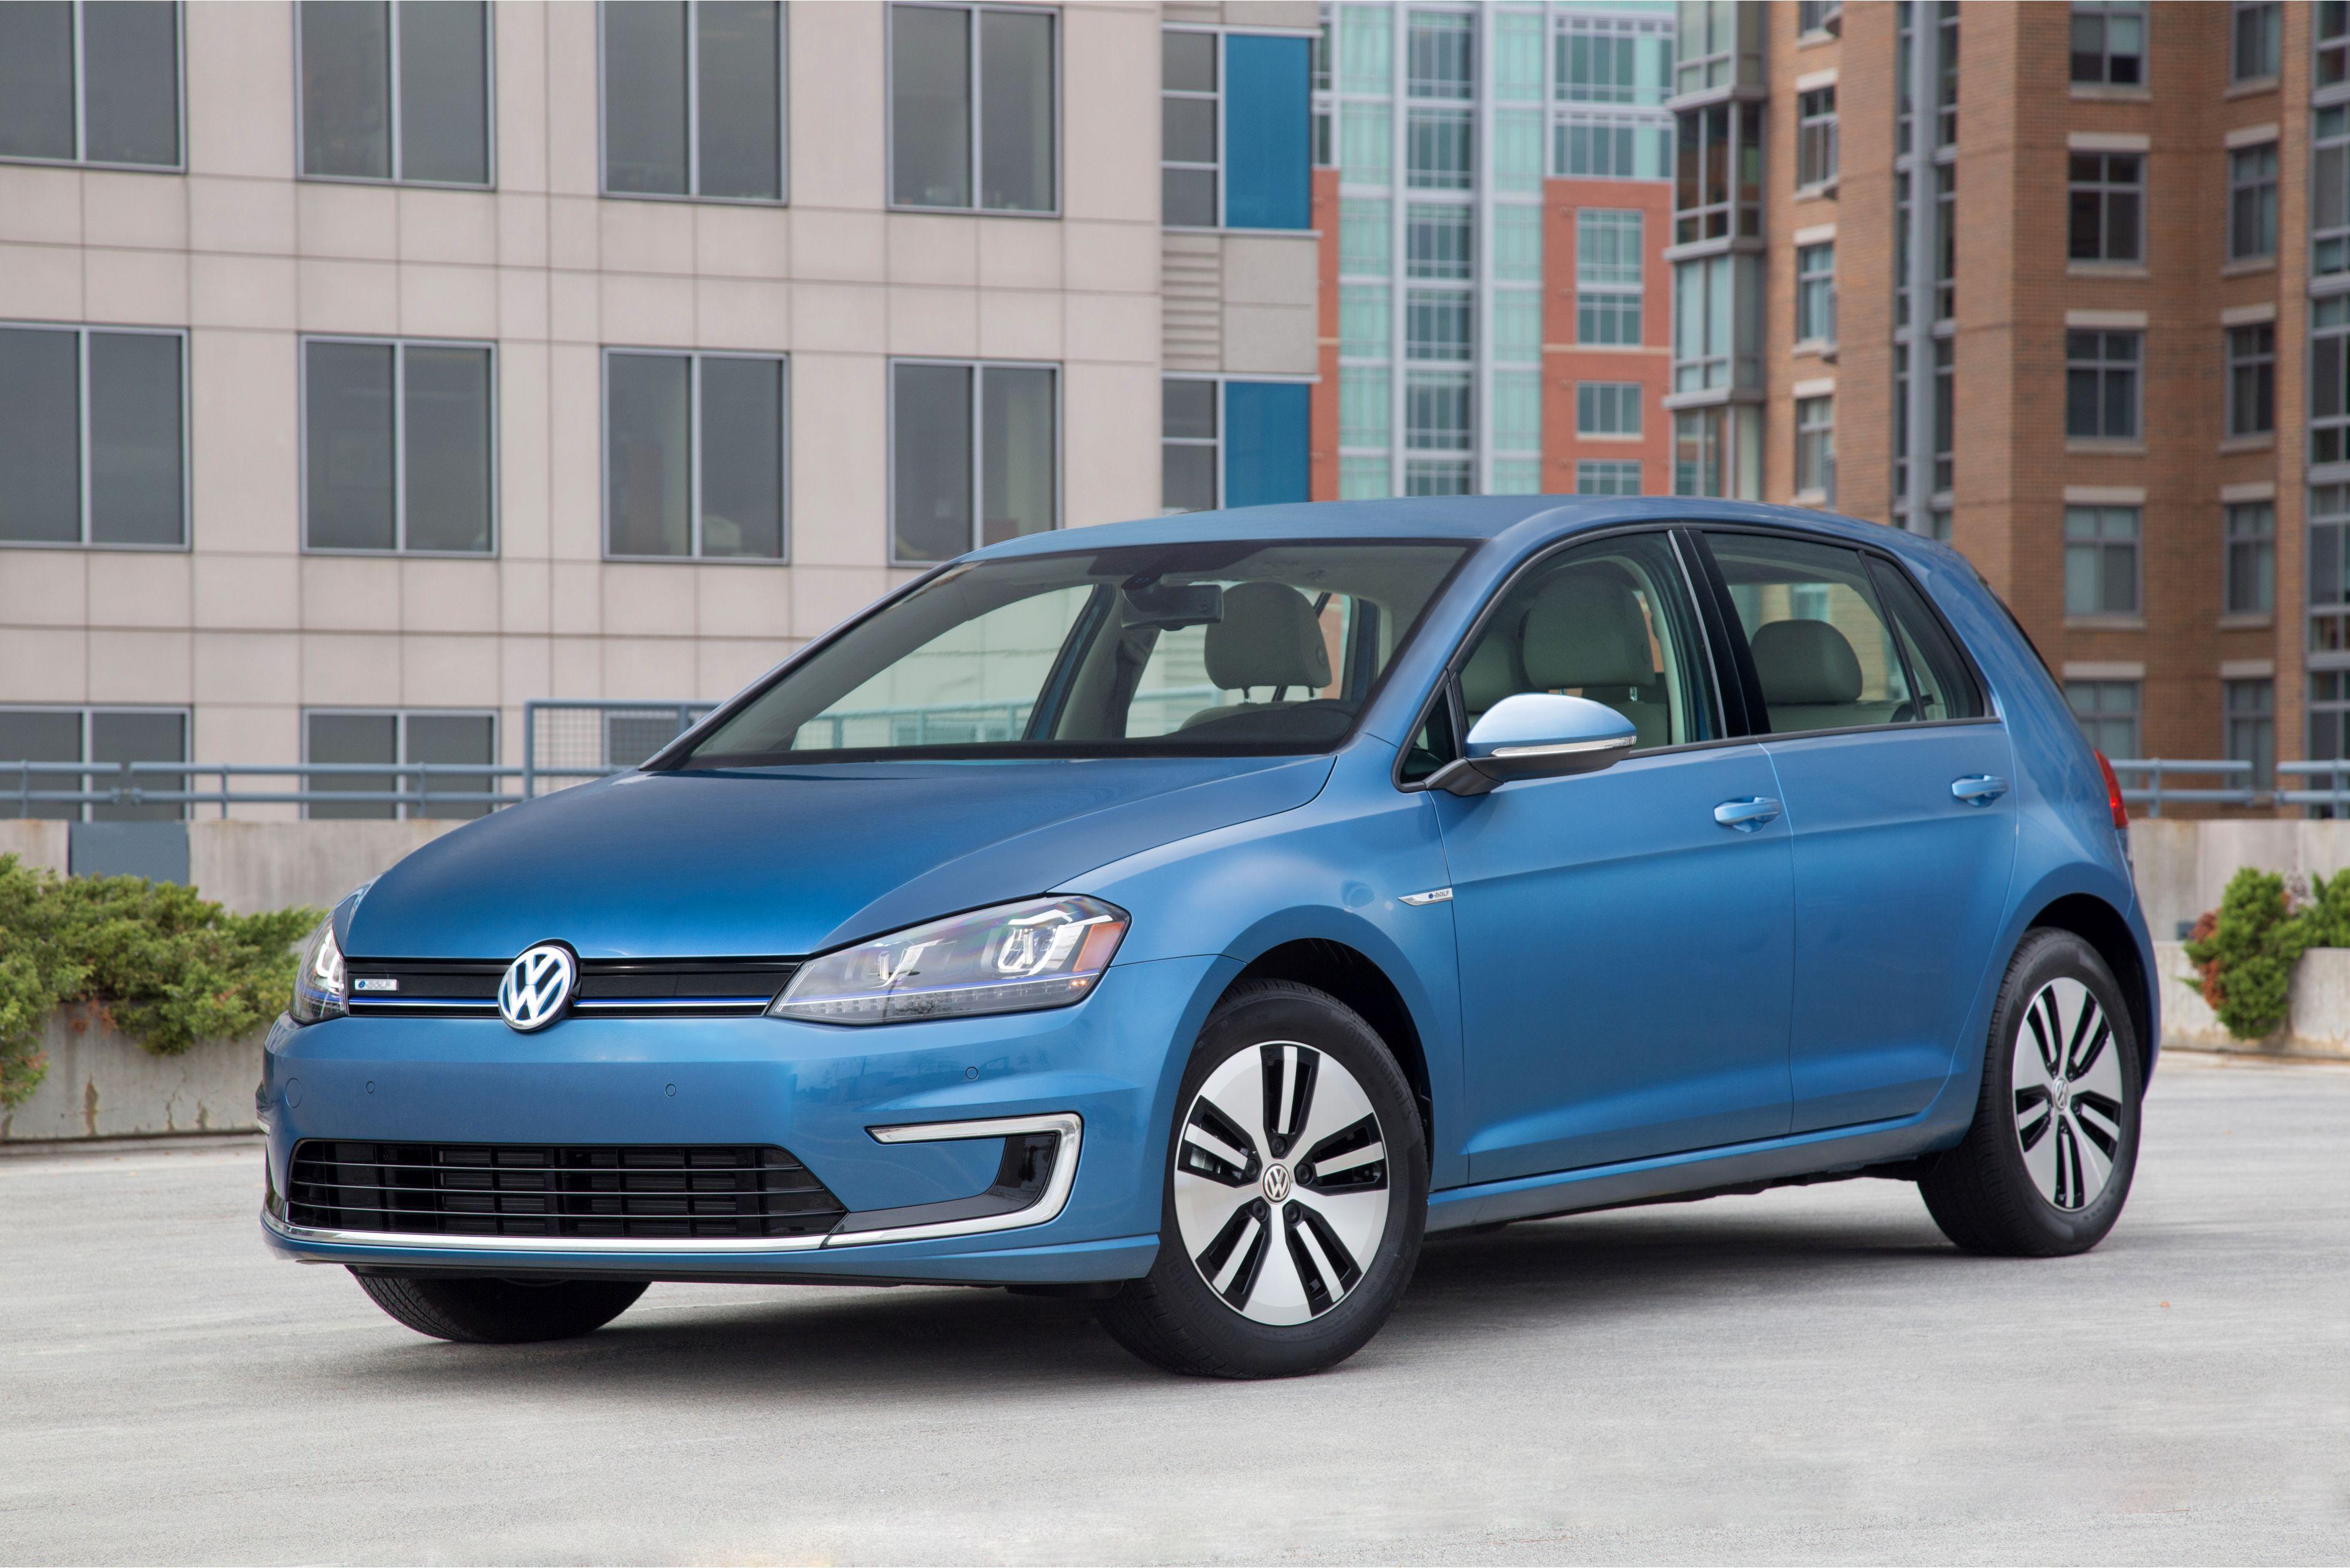 Volkswagen E Golf Arrives At Dealerships Green Fleet